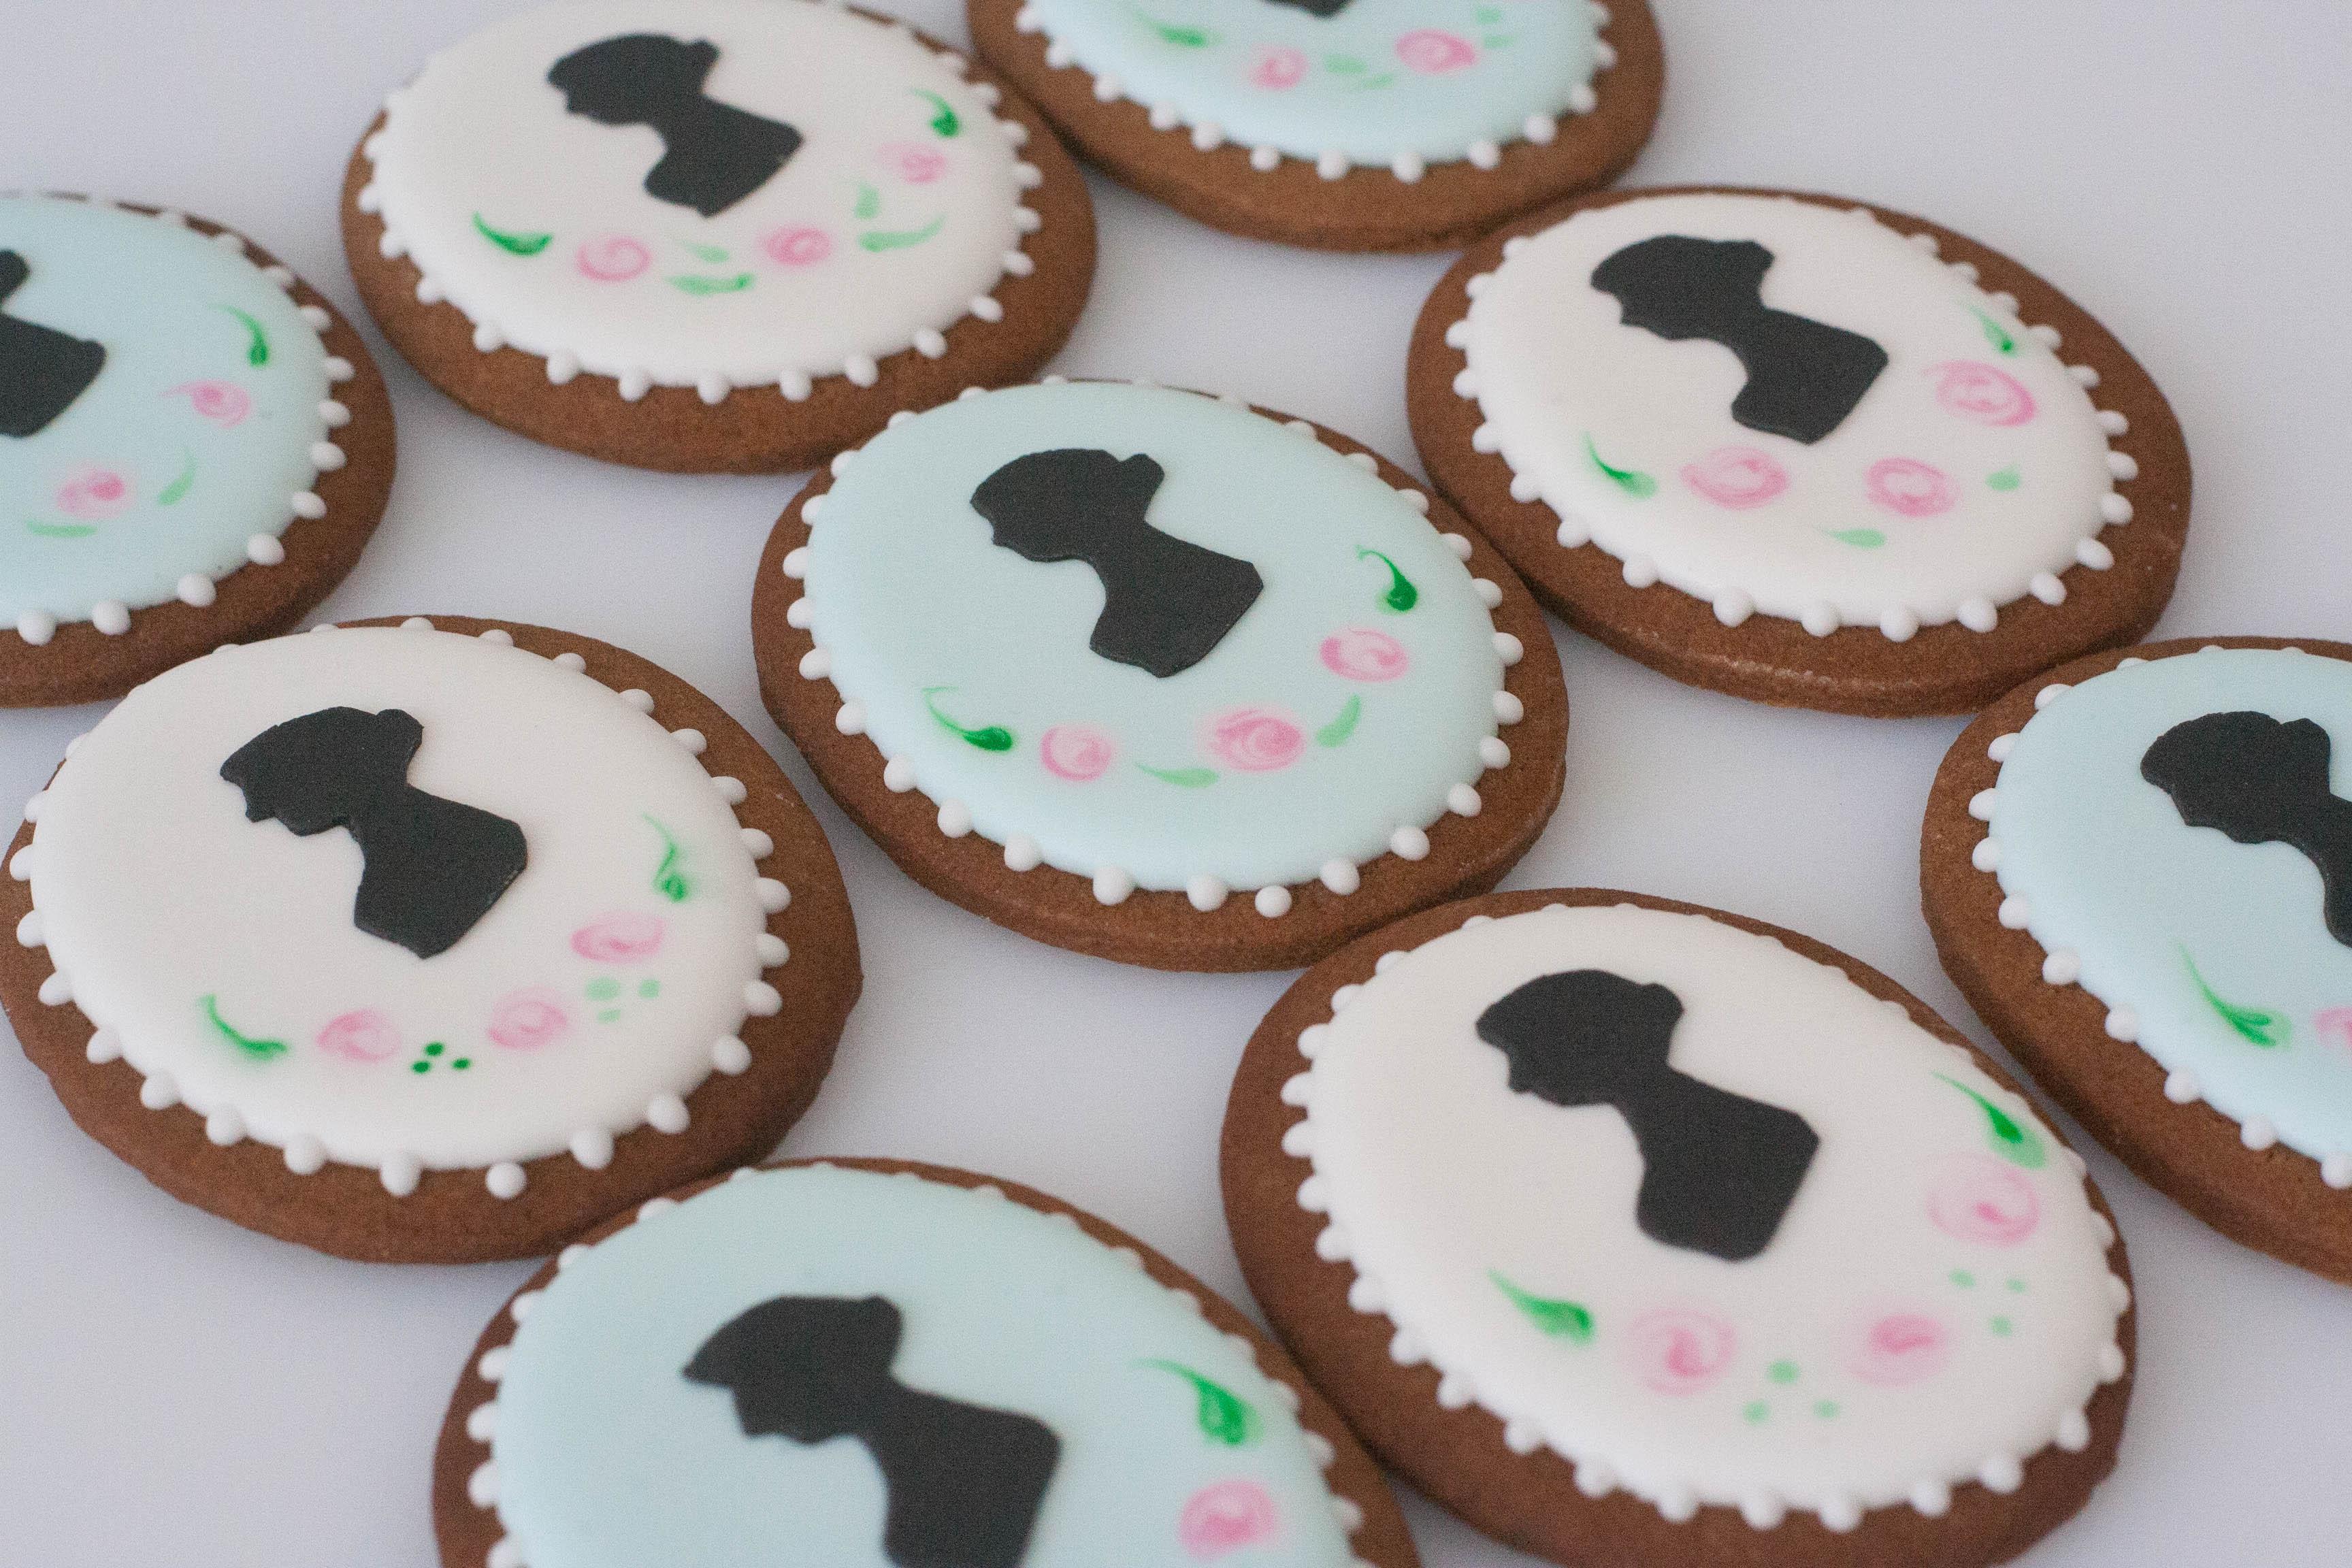 Jane Austen silhouette vegan cookies